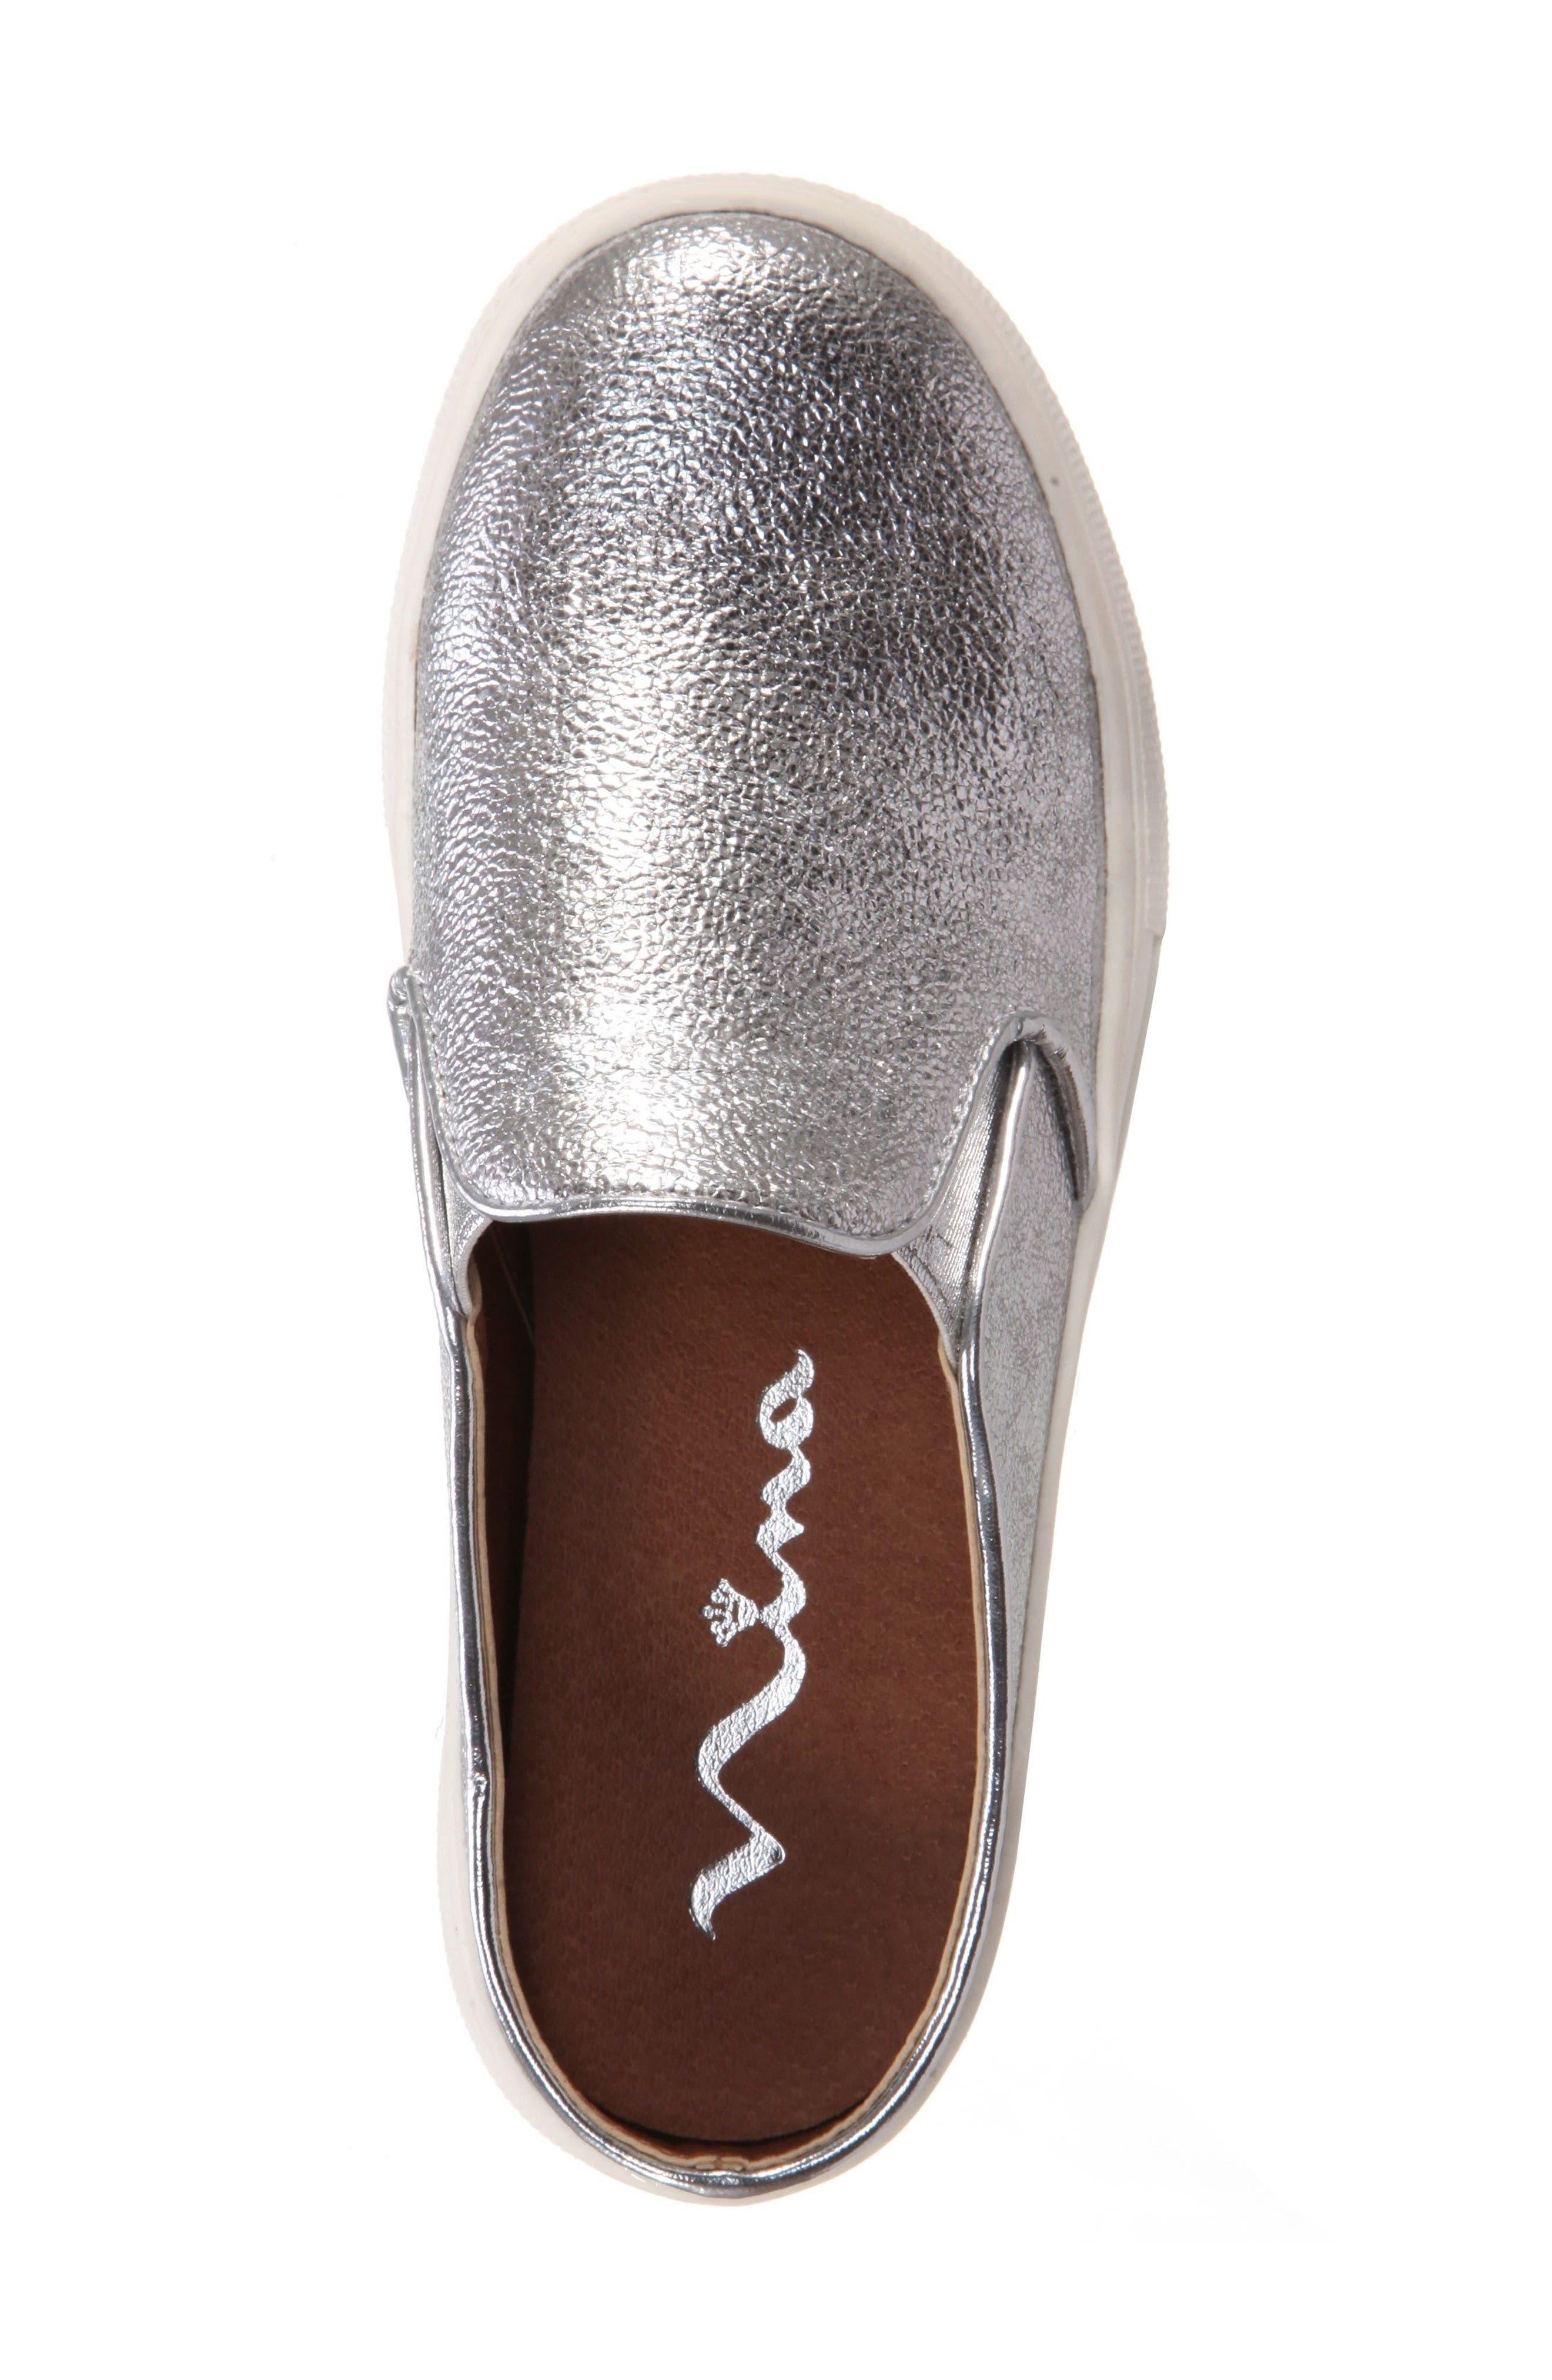 Gail Metallic Slip-On Sneaker Mule,                             Alternate thumbnail 5, color,                             044